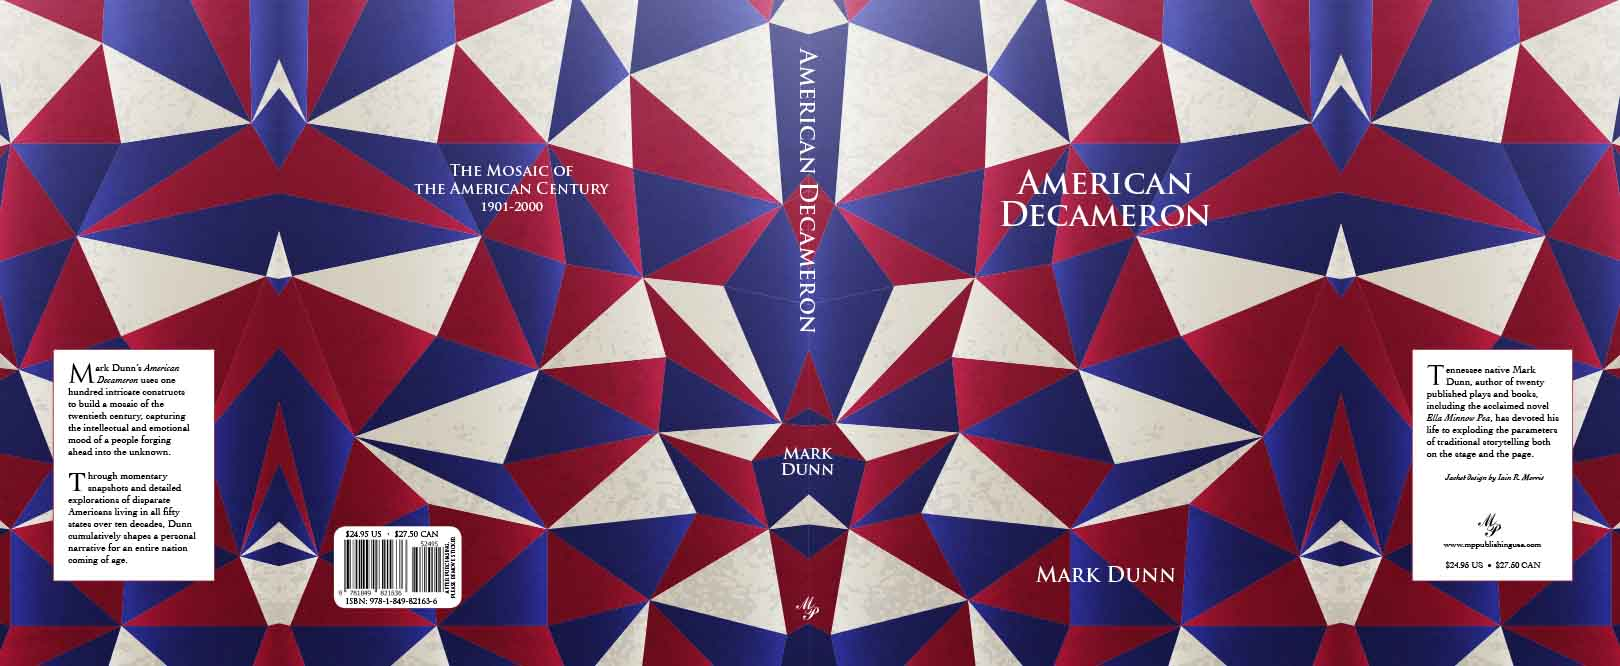 AmericanDecameronJacket.jpg